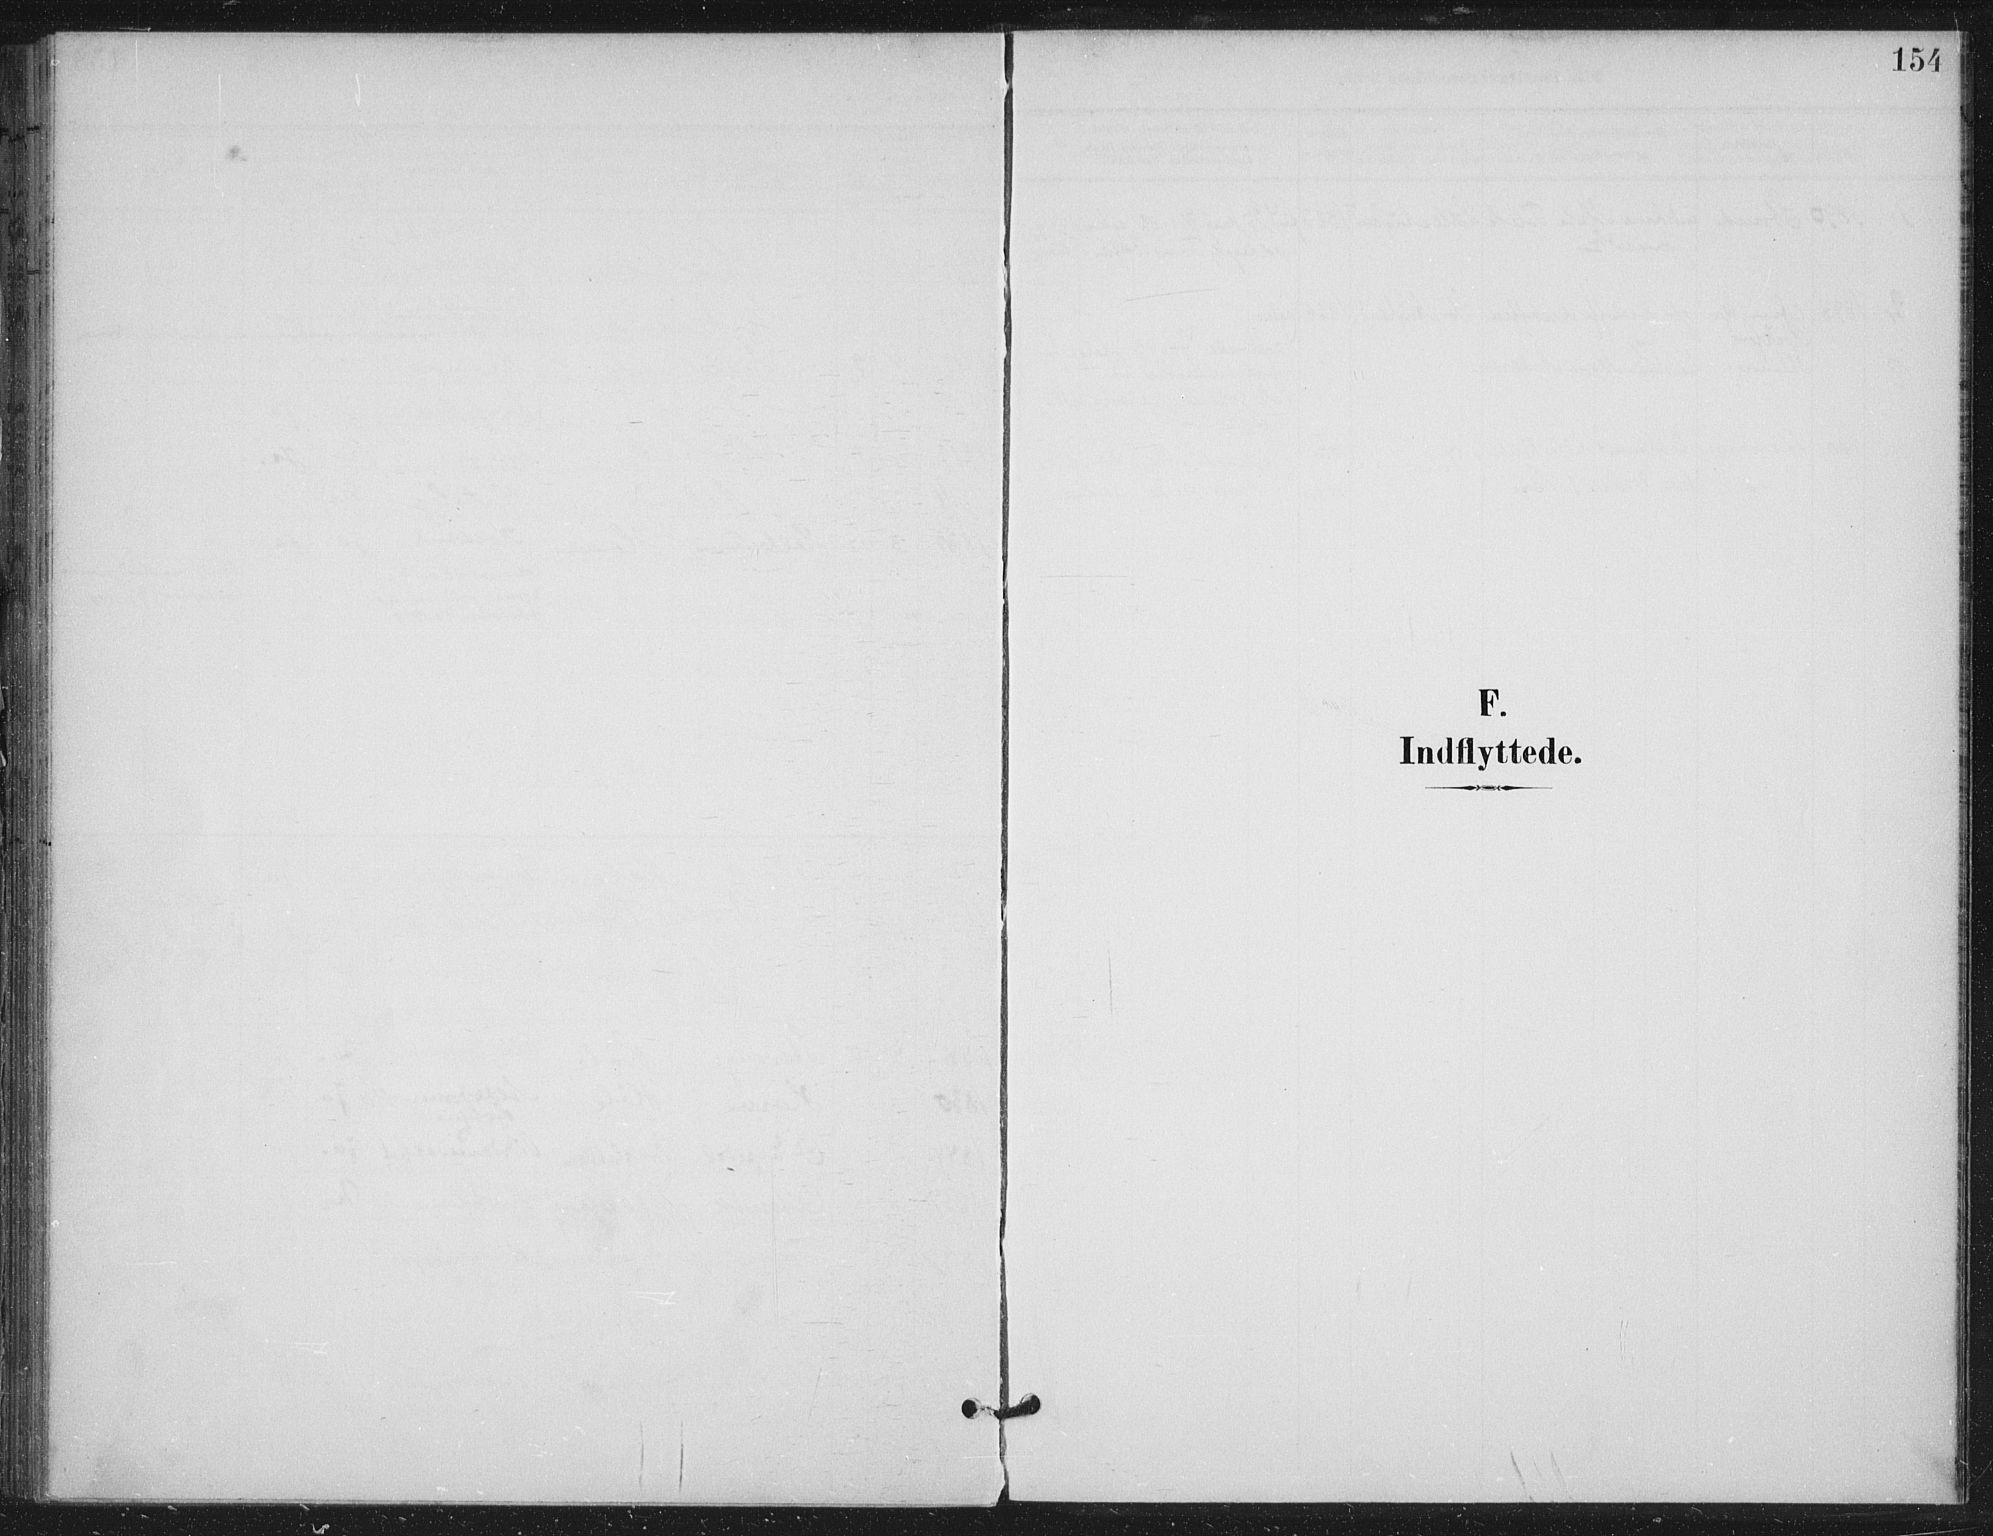 SAST, Høgsfjord sokneprestkontor, H/Ha/Haa/L0008: Ministerialbok nr. A 8, 1898-1920, s. 154